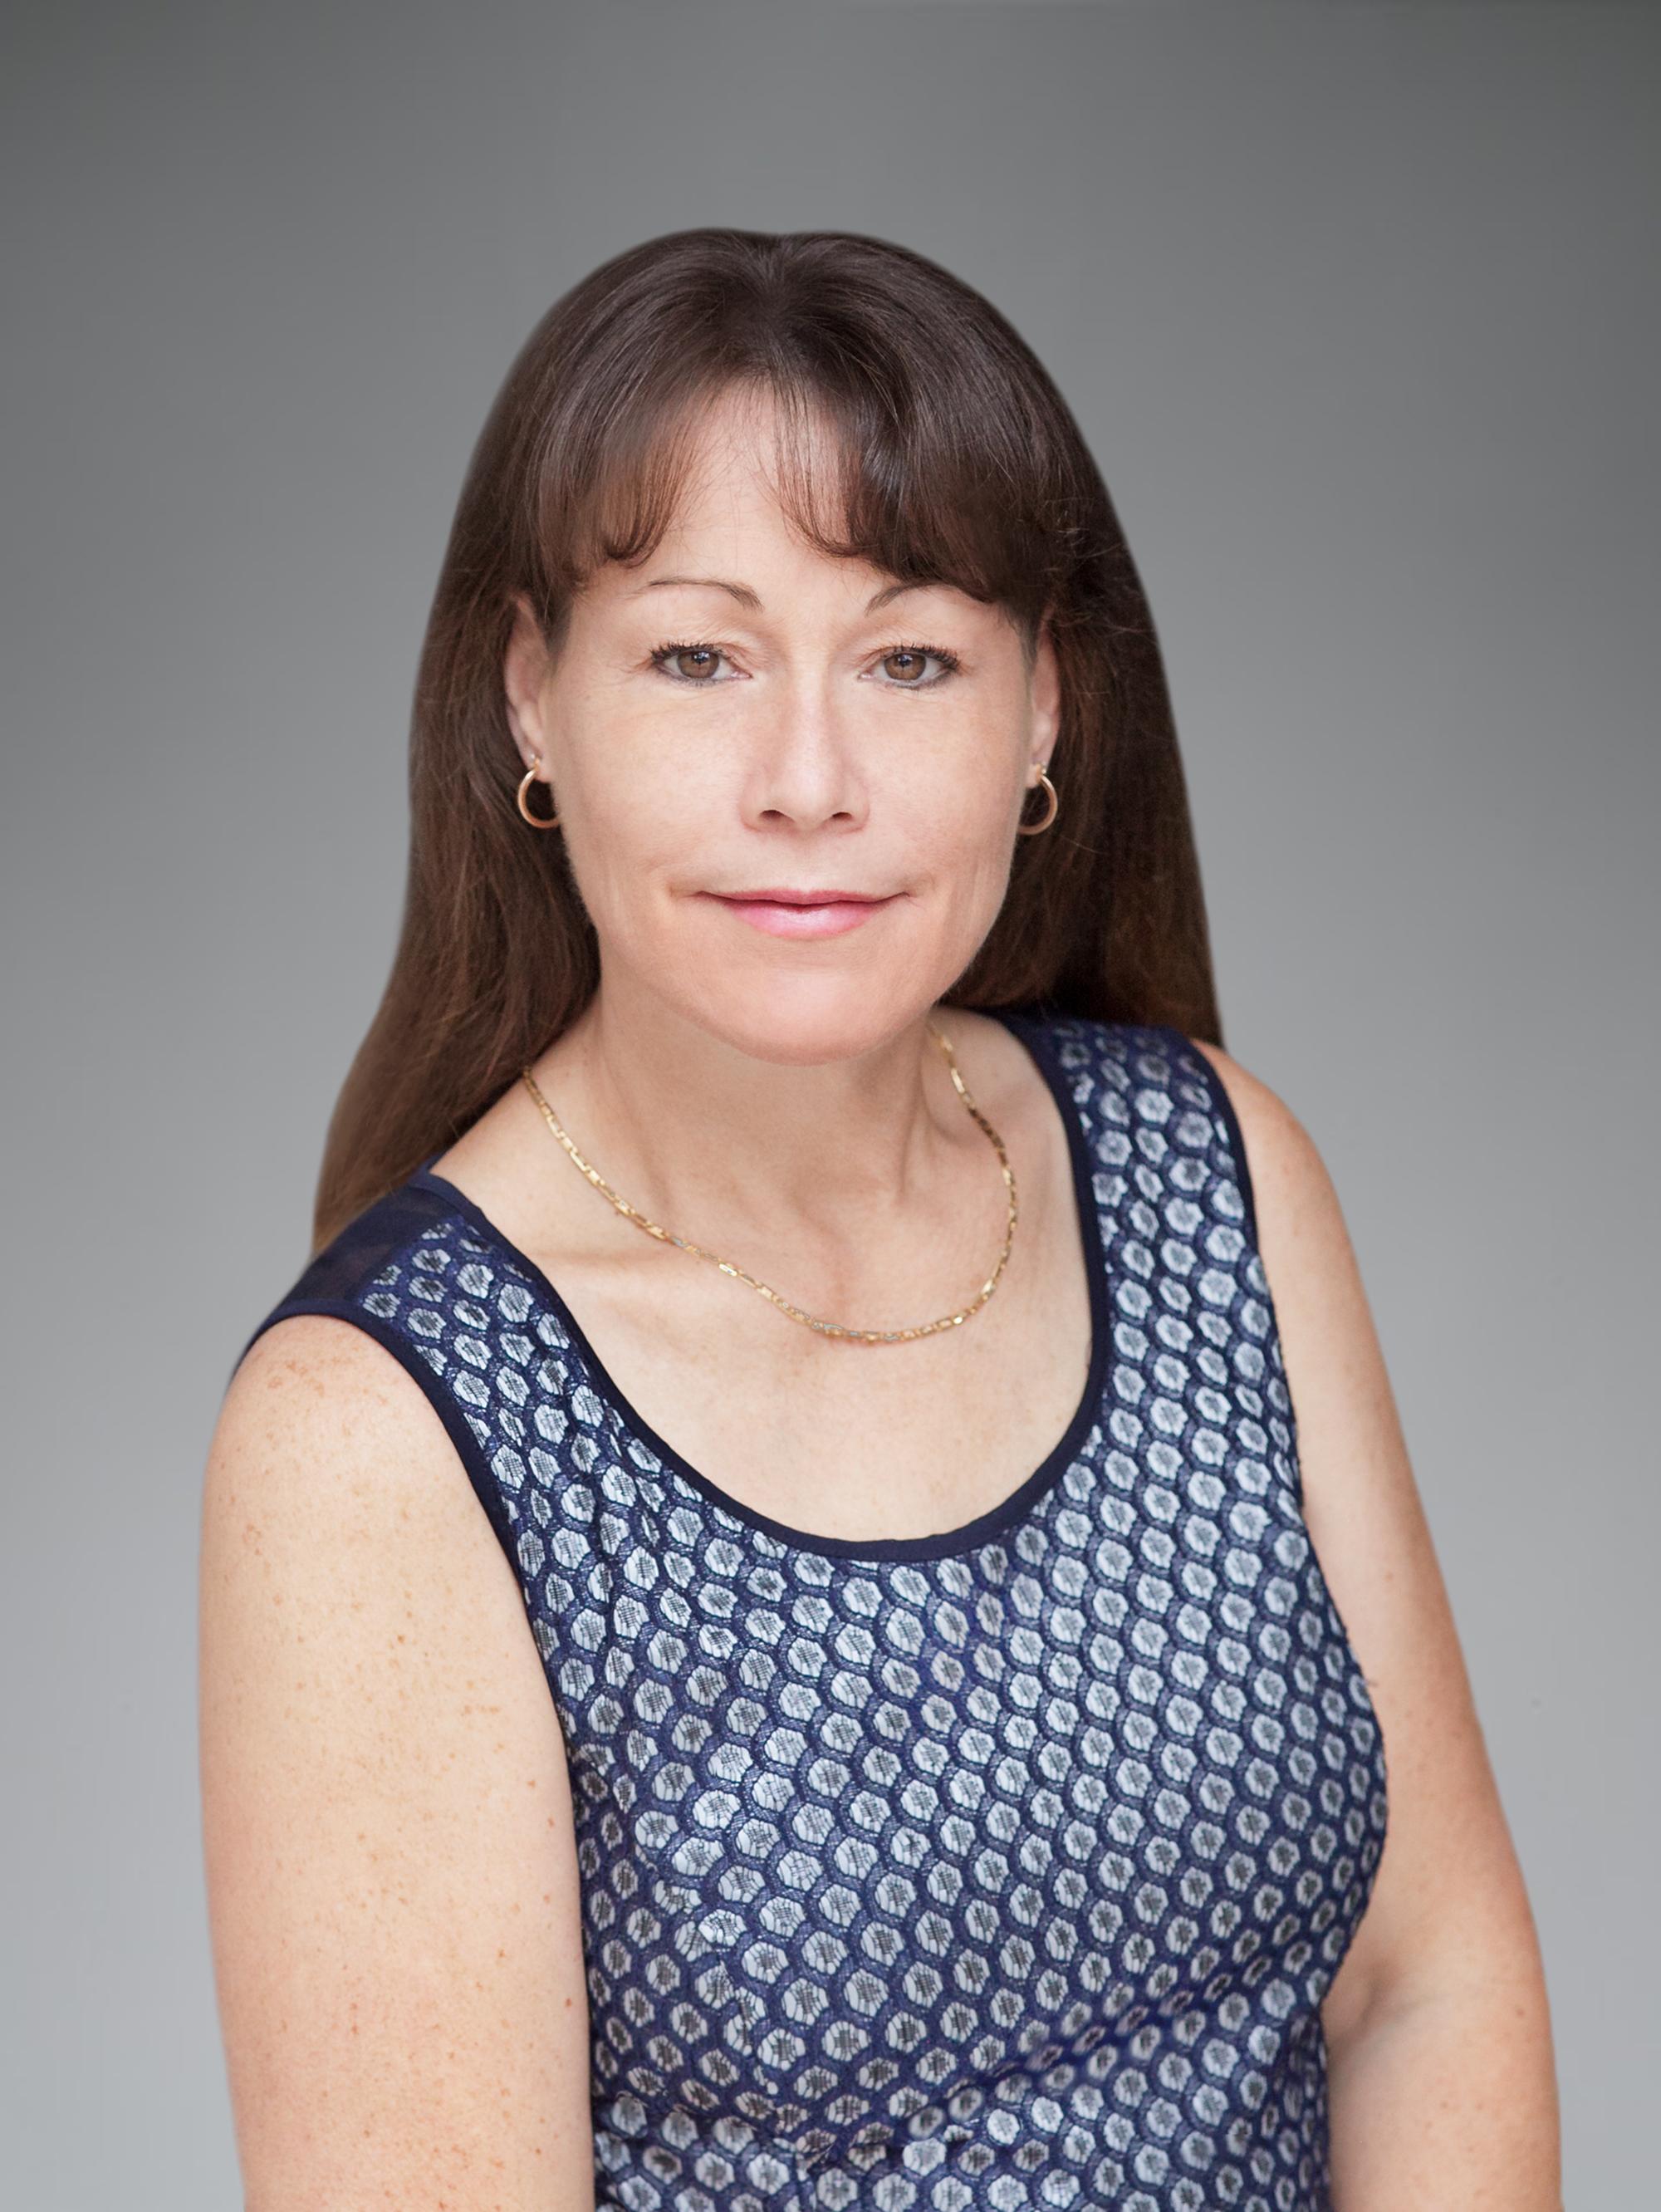 Jolie Karunuñgan - Director of Underwriting Services & Operations